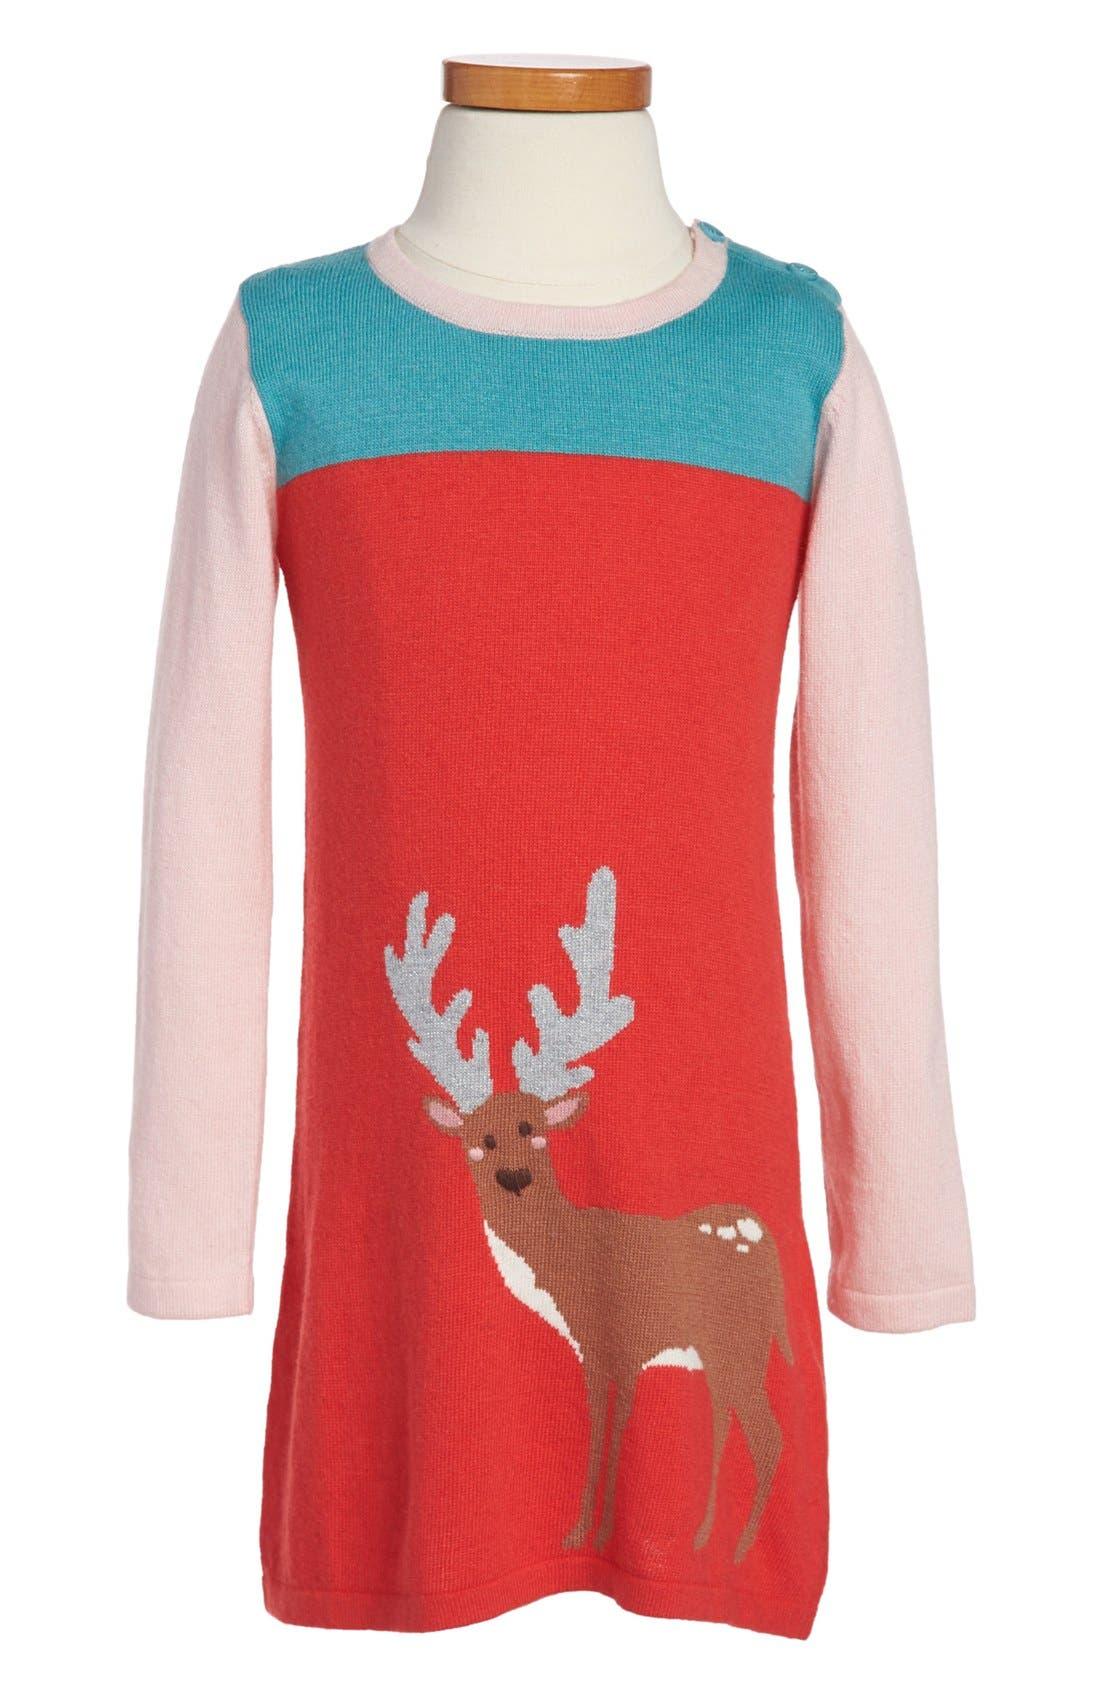 Main Image - Mini Boden 'Woodland' Knit Dress (Toddler Girls, Little Girls)